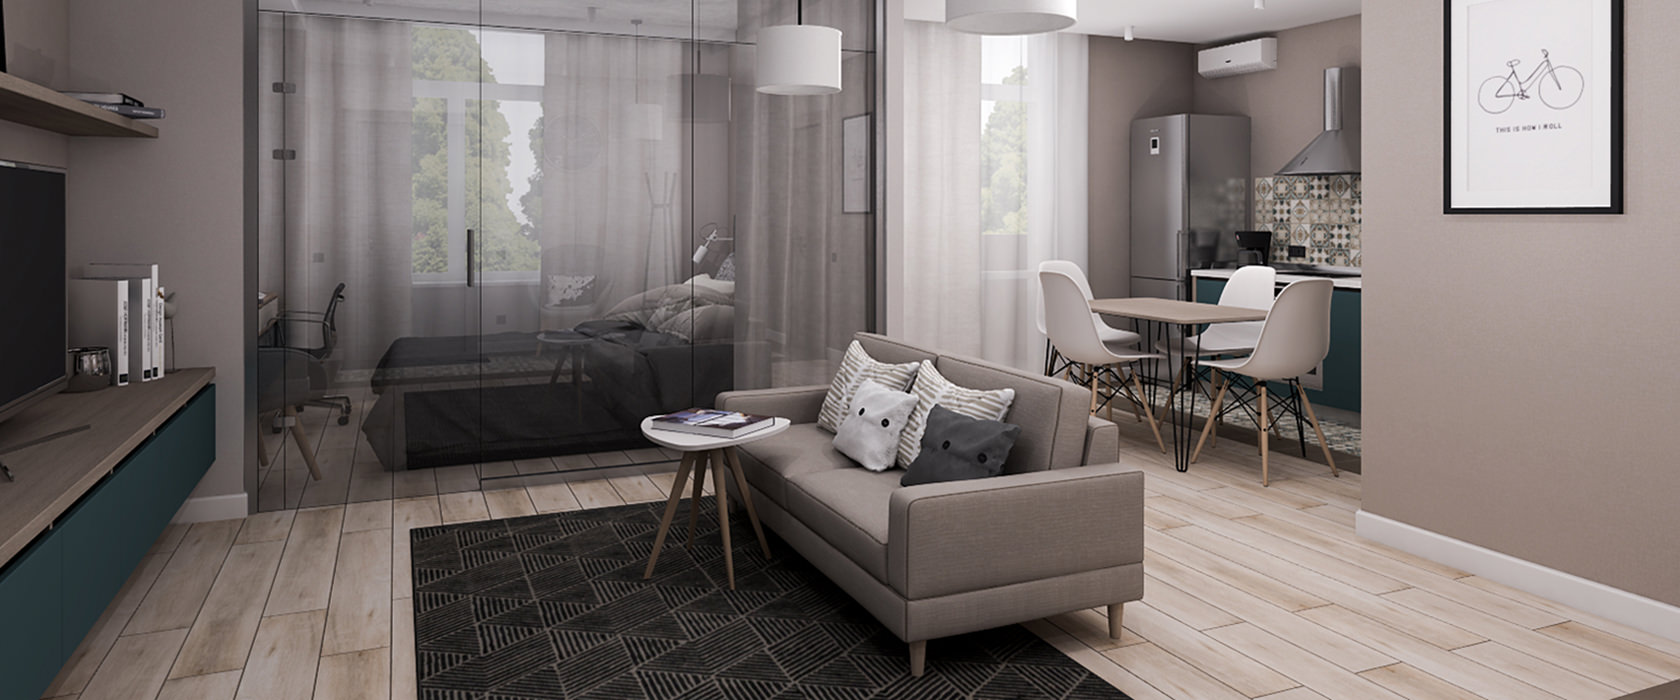 Двухместный диван Bruno - Фото 1 - Pufetto